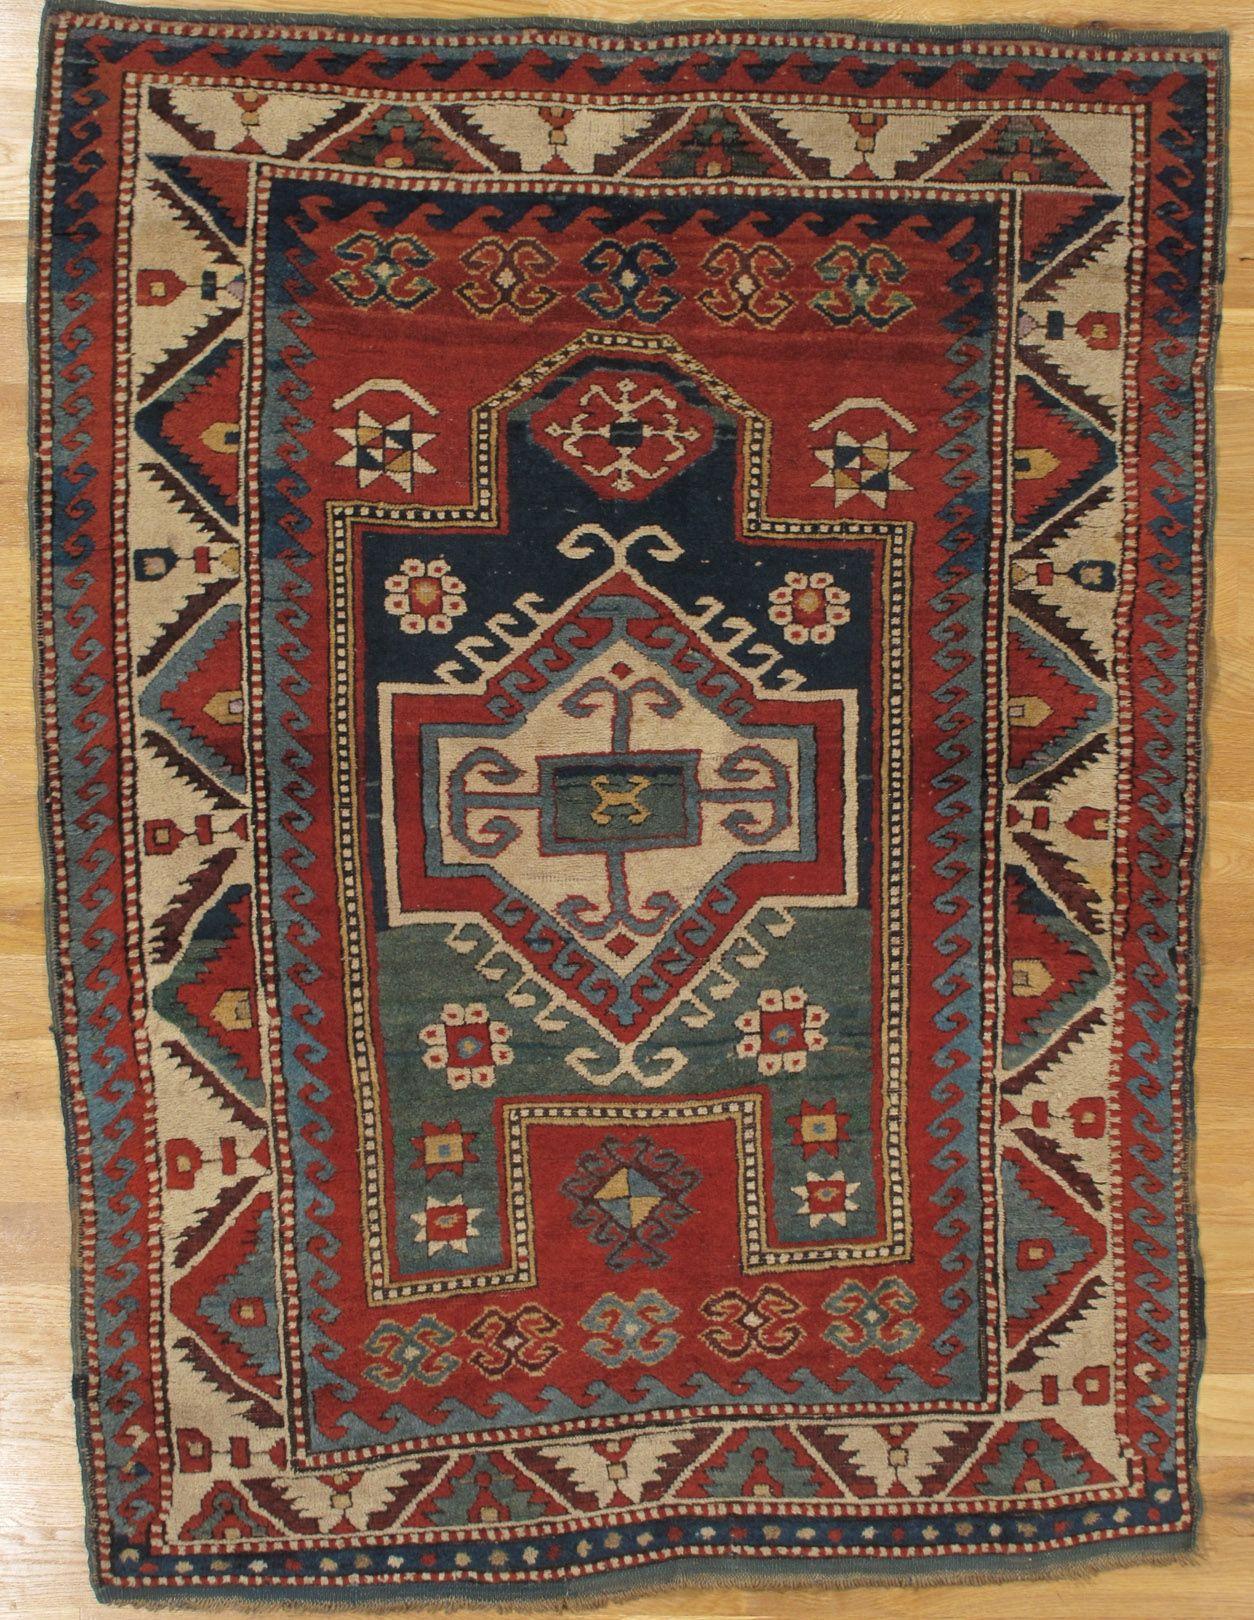 Fachralo Prayer Kazak Rug From Southwest Caucasus Age Circa 1880 Size 5 3 X4 0 160x122 Cm Sold Rugs Antique Rugs Carpet Handmade